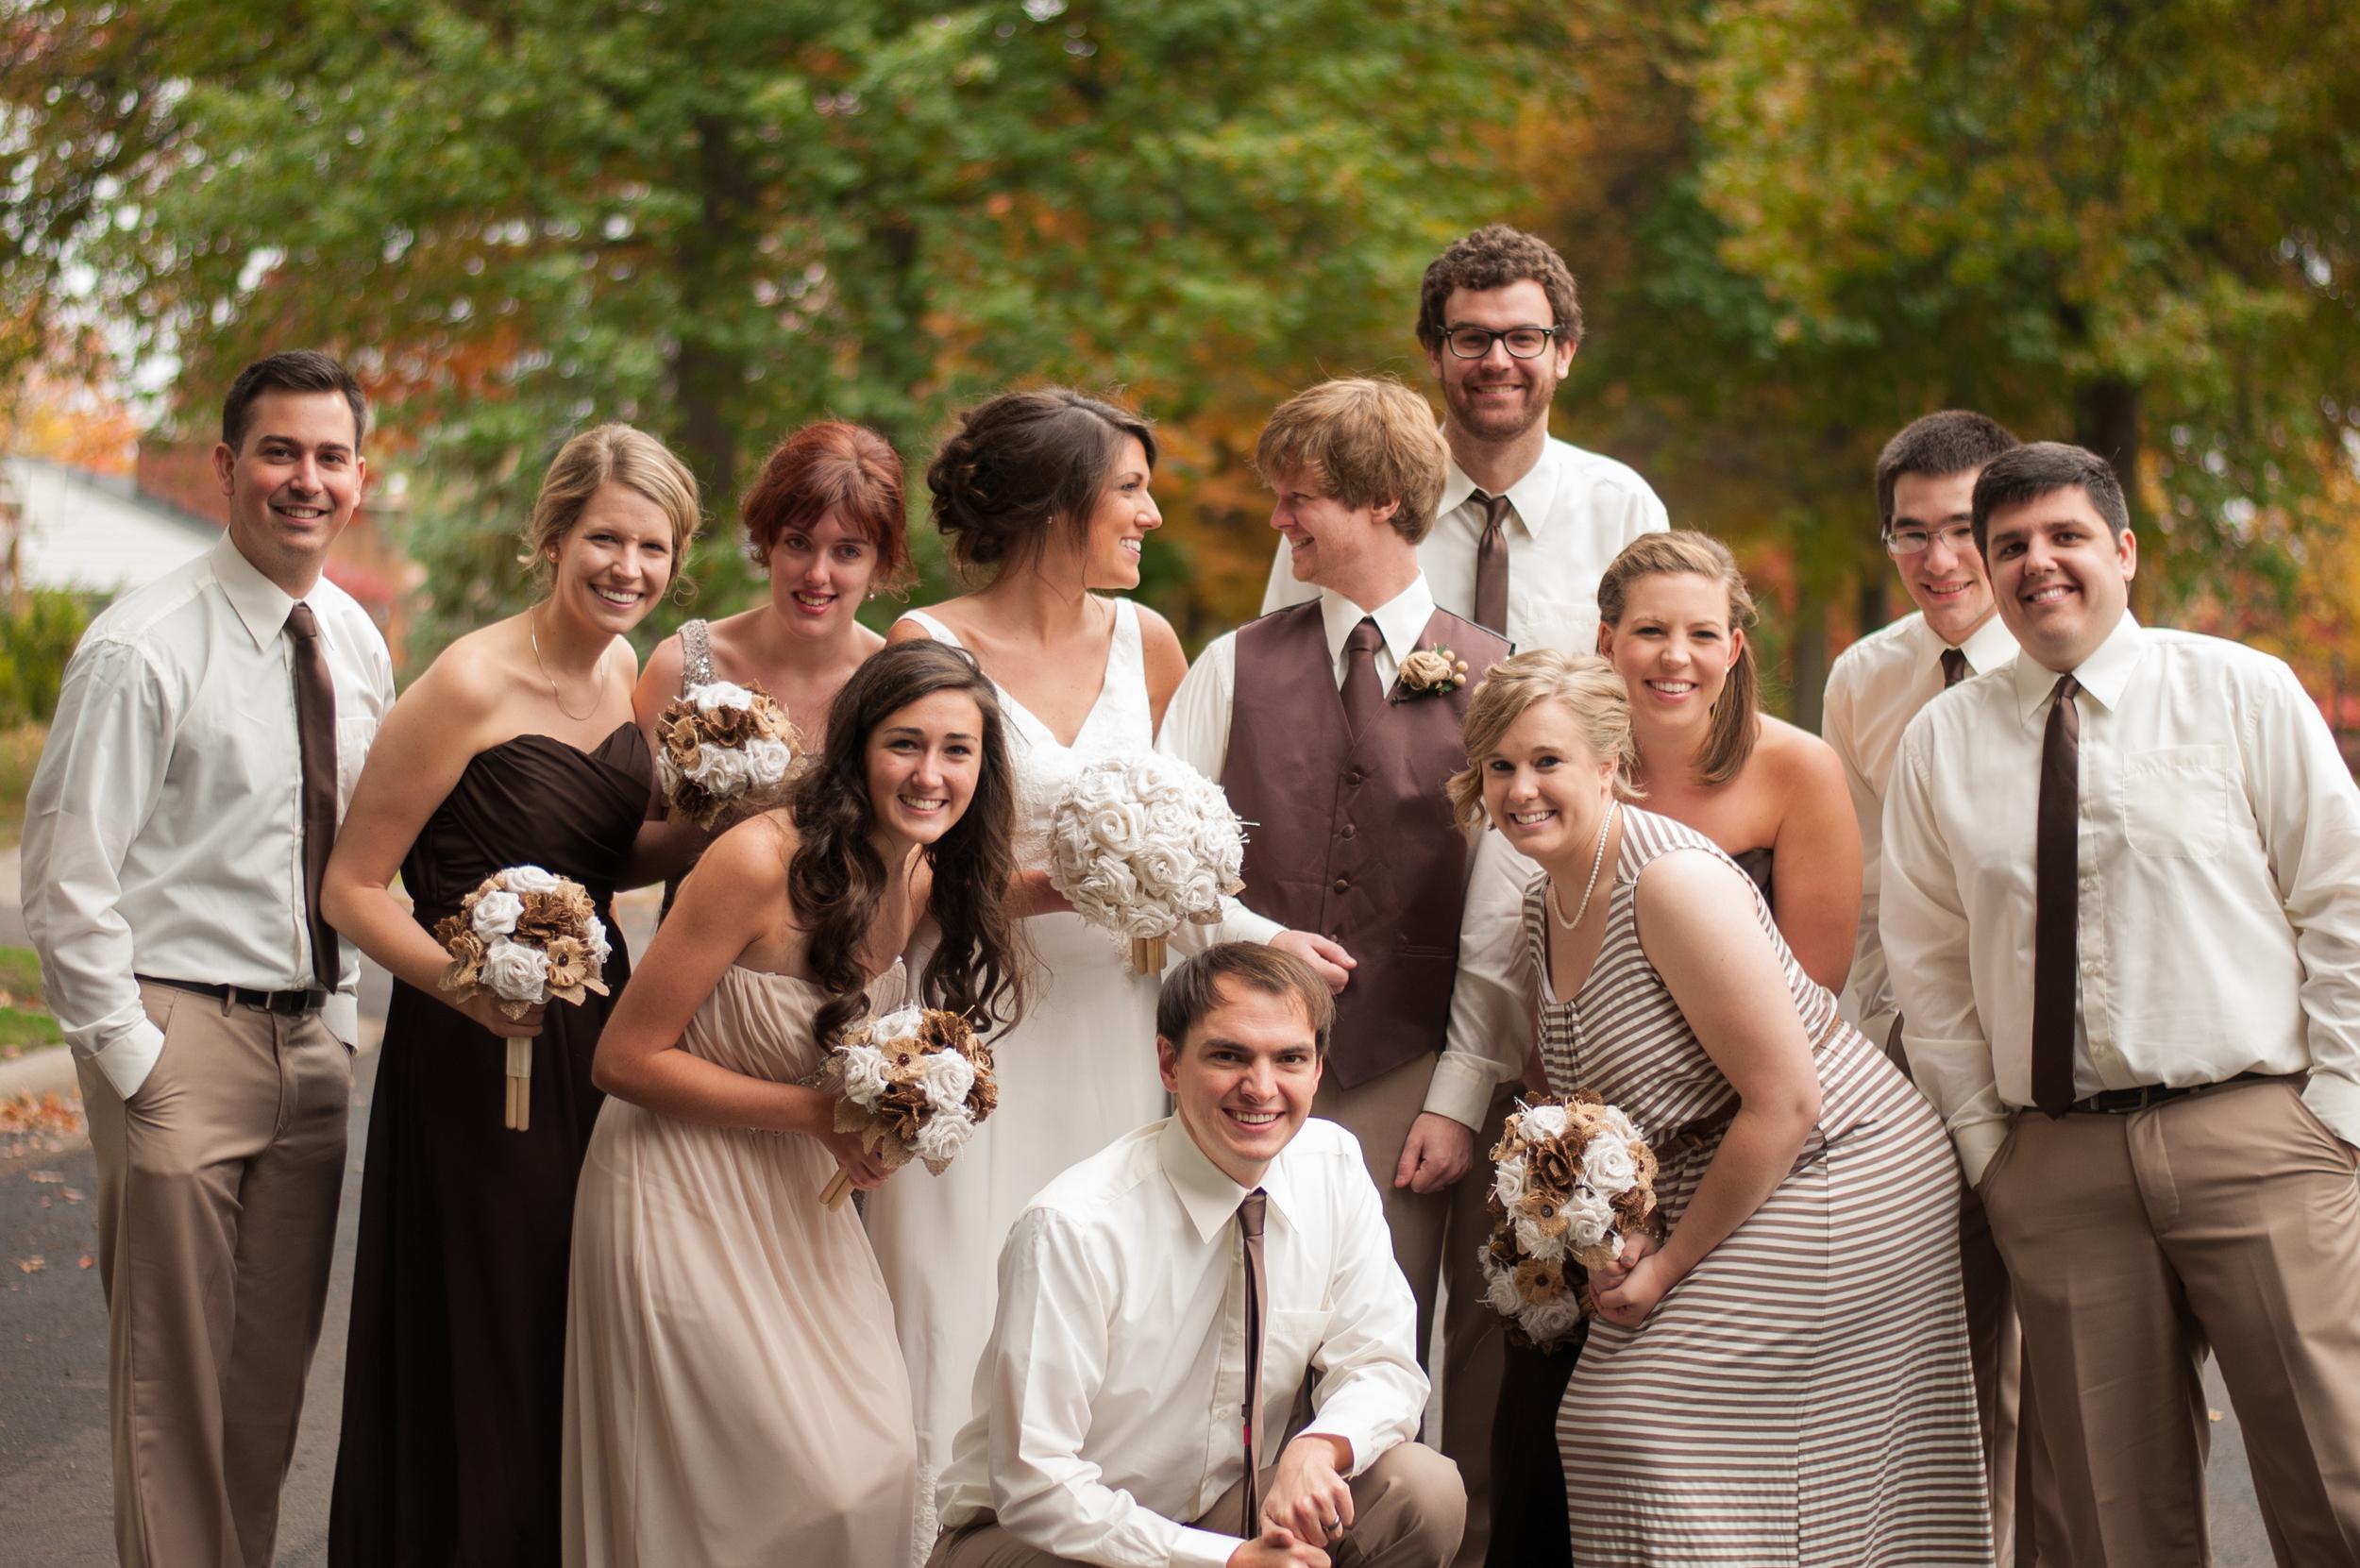 meredithdonnellyphotography-youngweddingwebsite-57.jpg